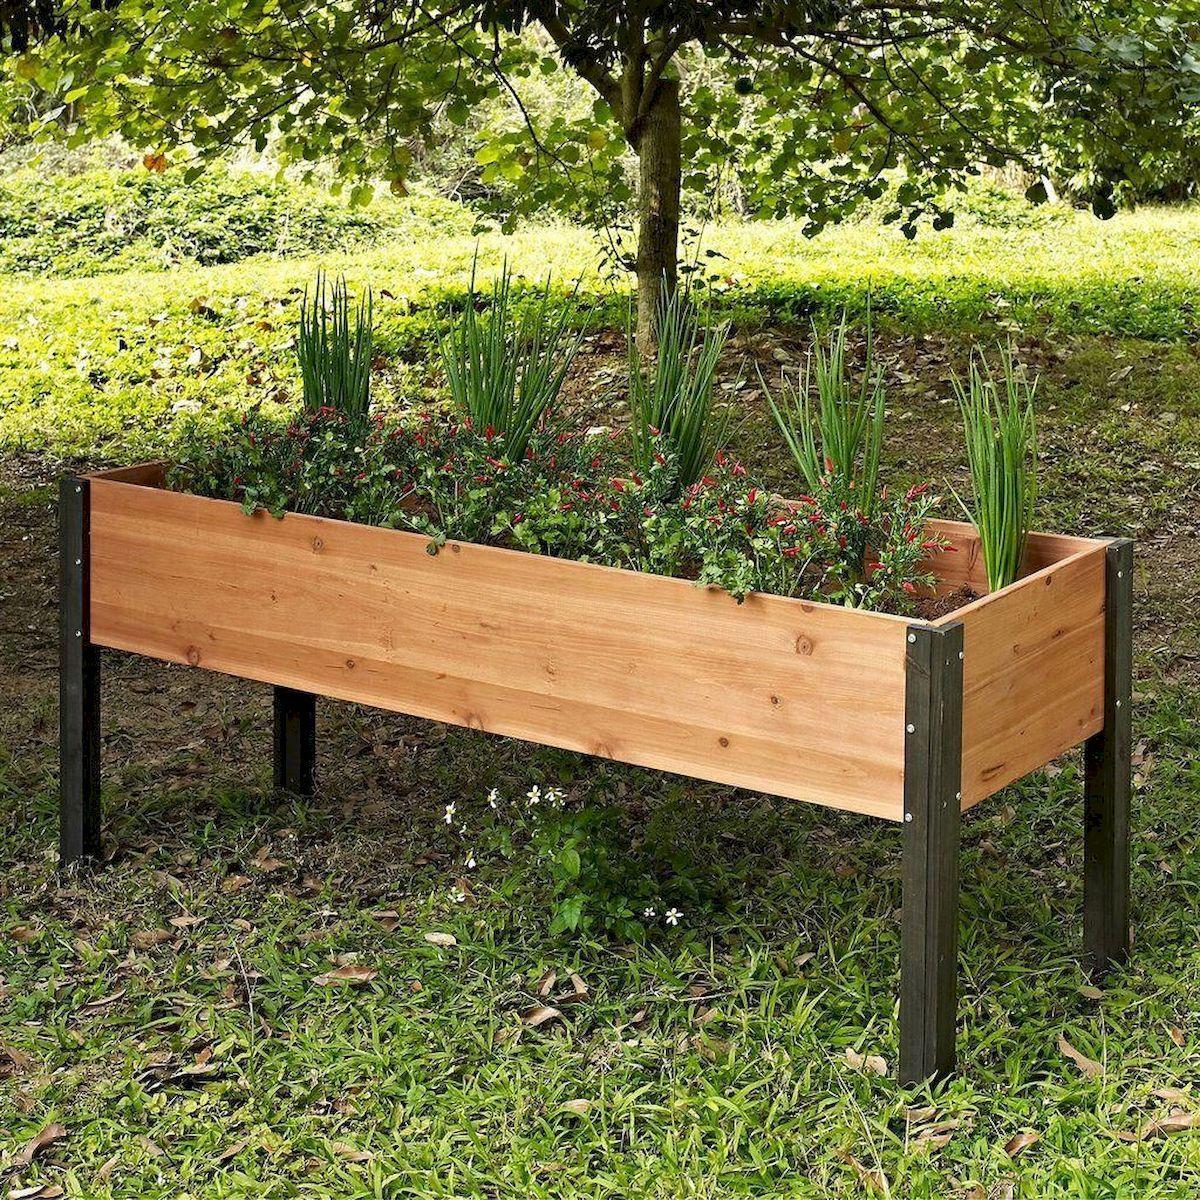 50 awesome gardens designs ideas backyard landscape